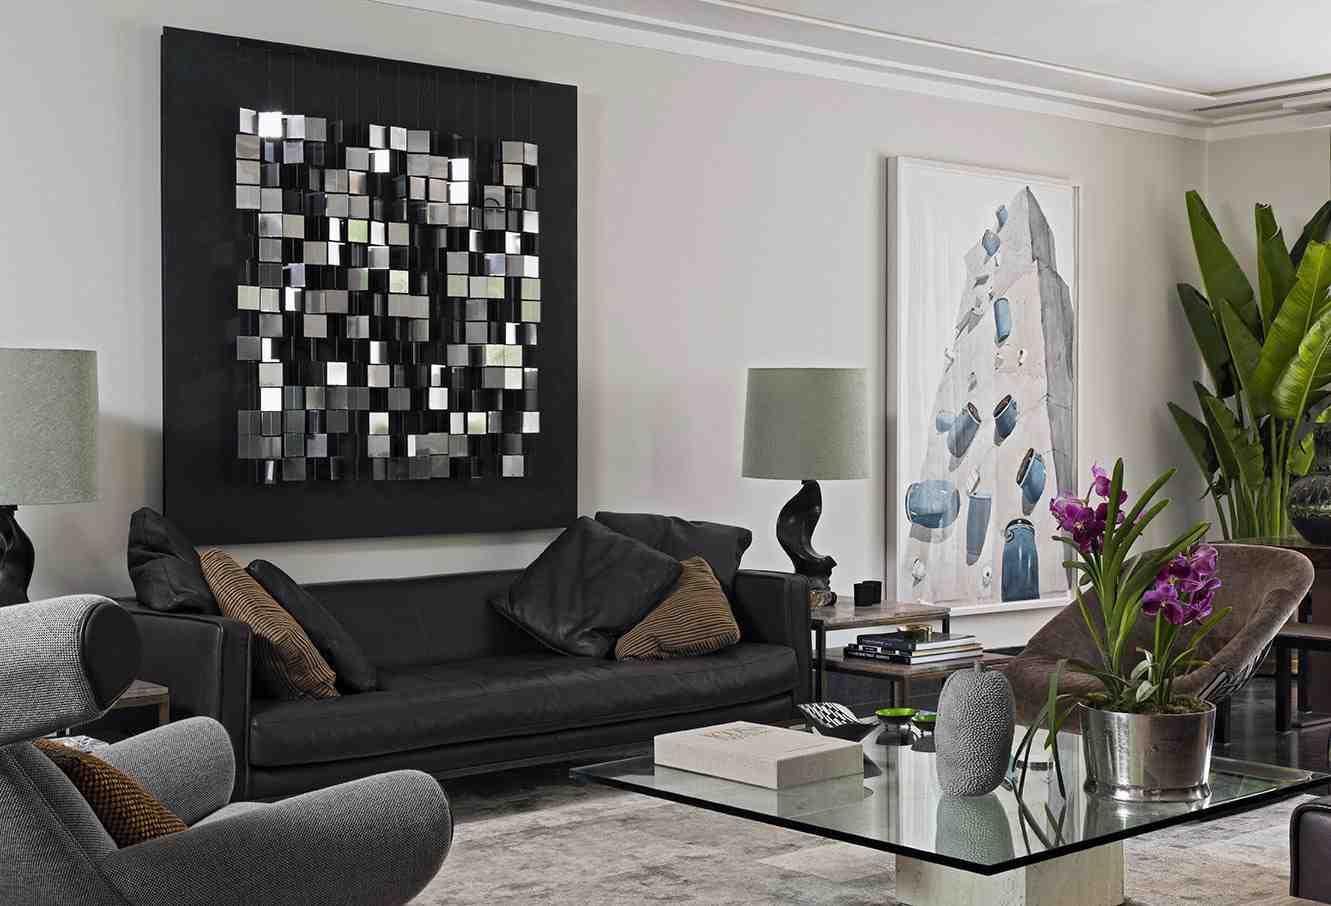 Living Room Wall Decor: 5 Options